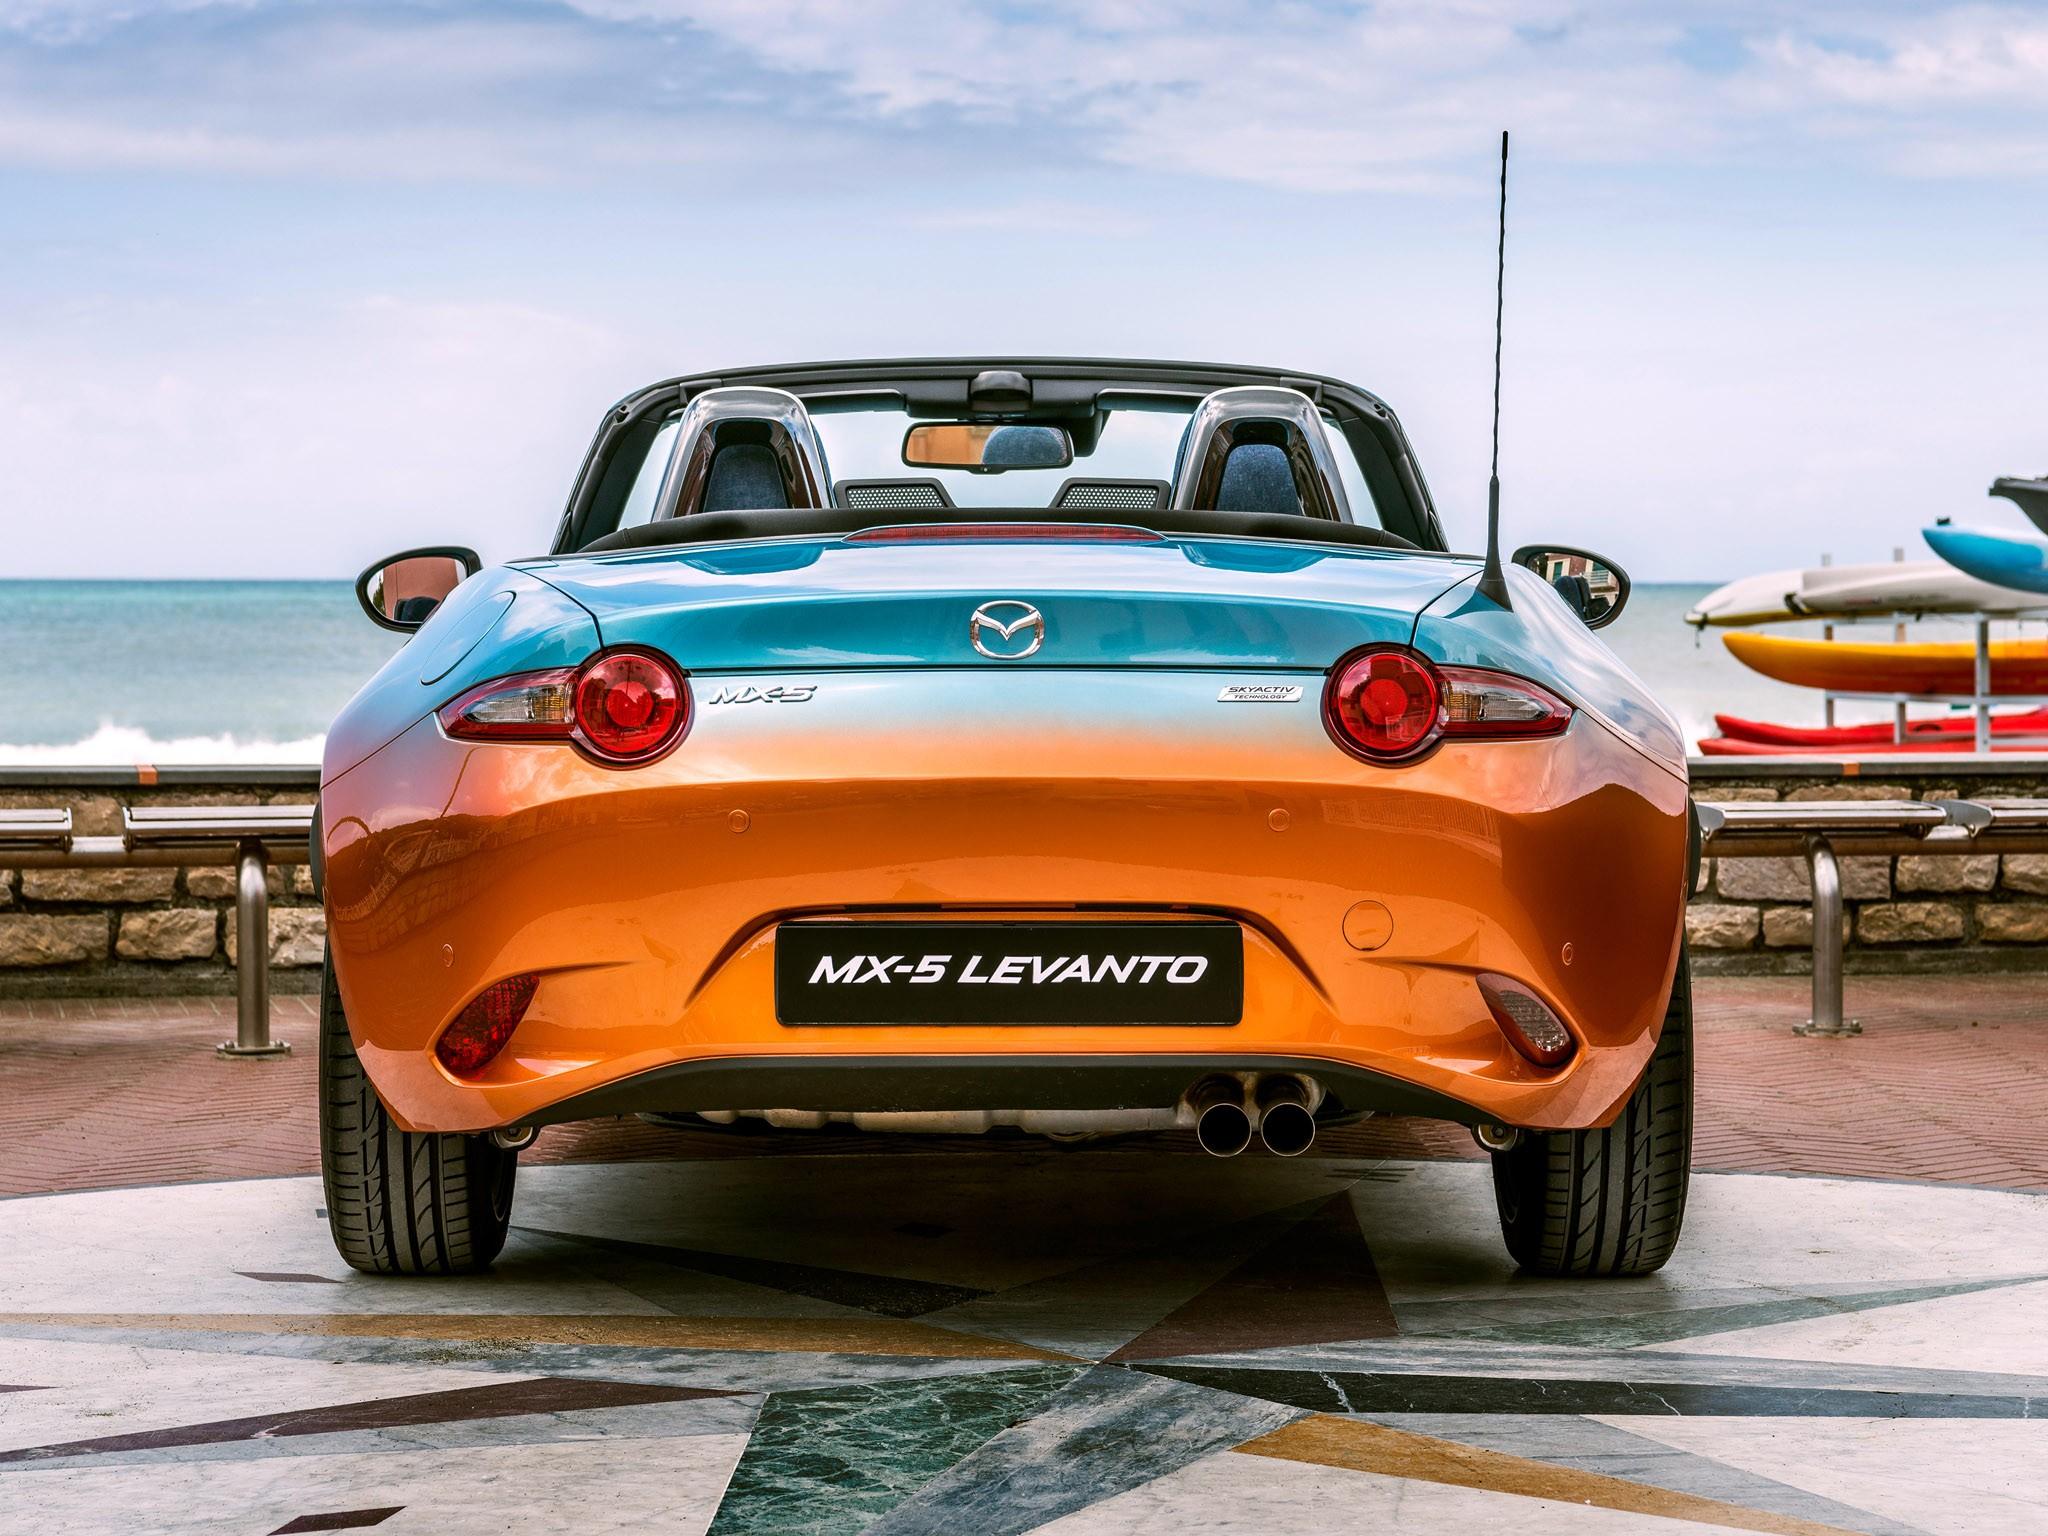 2016 Mazda MX-5 Levanto by Garage Italia Customs